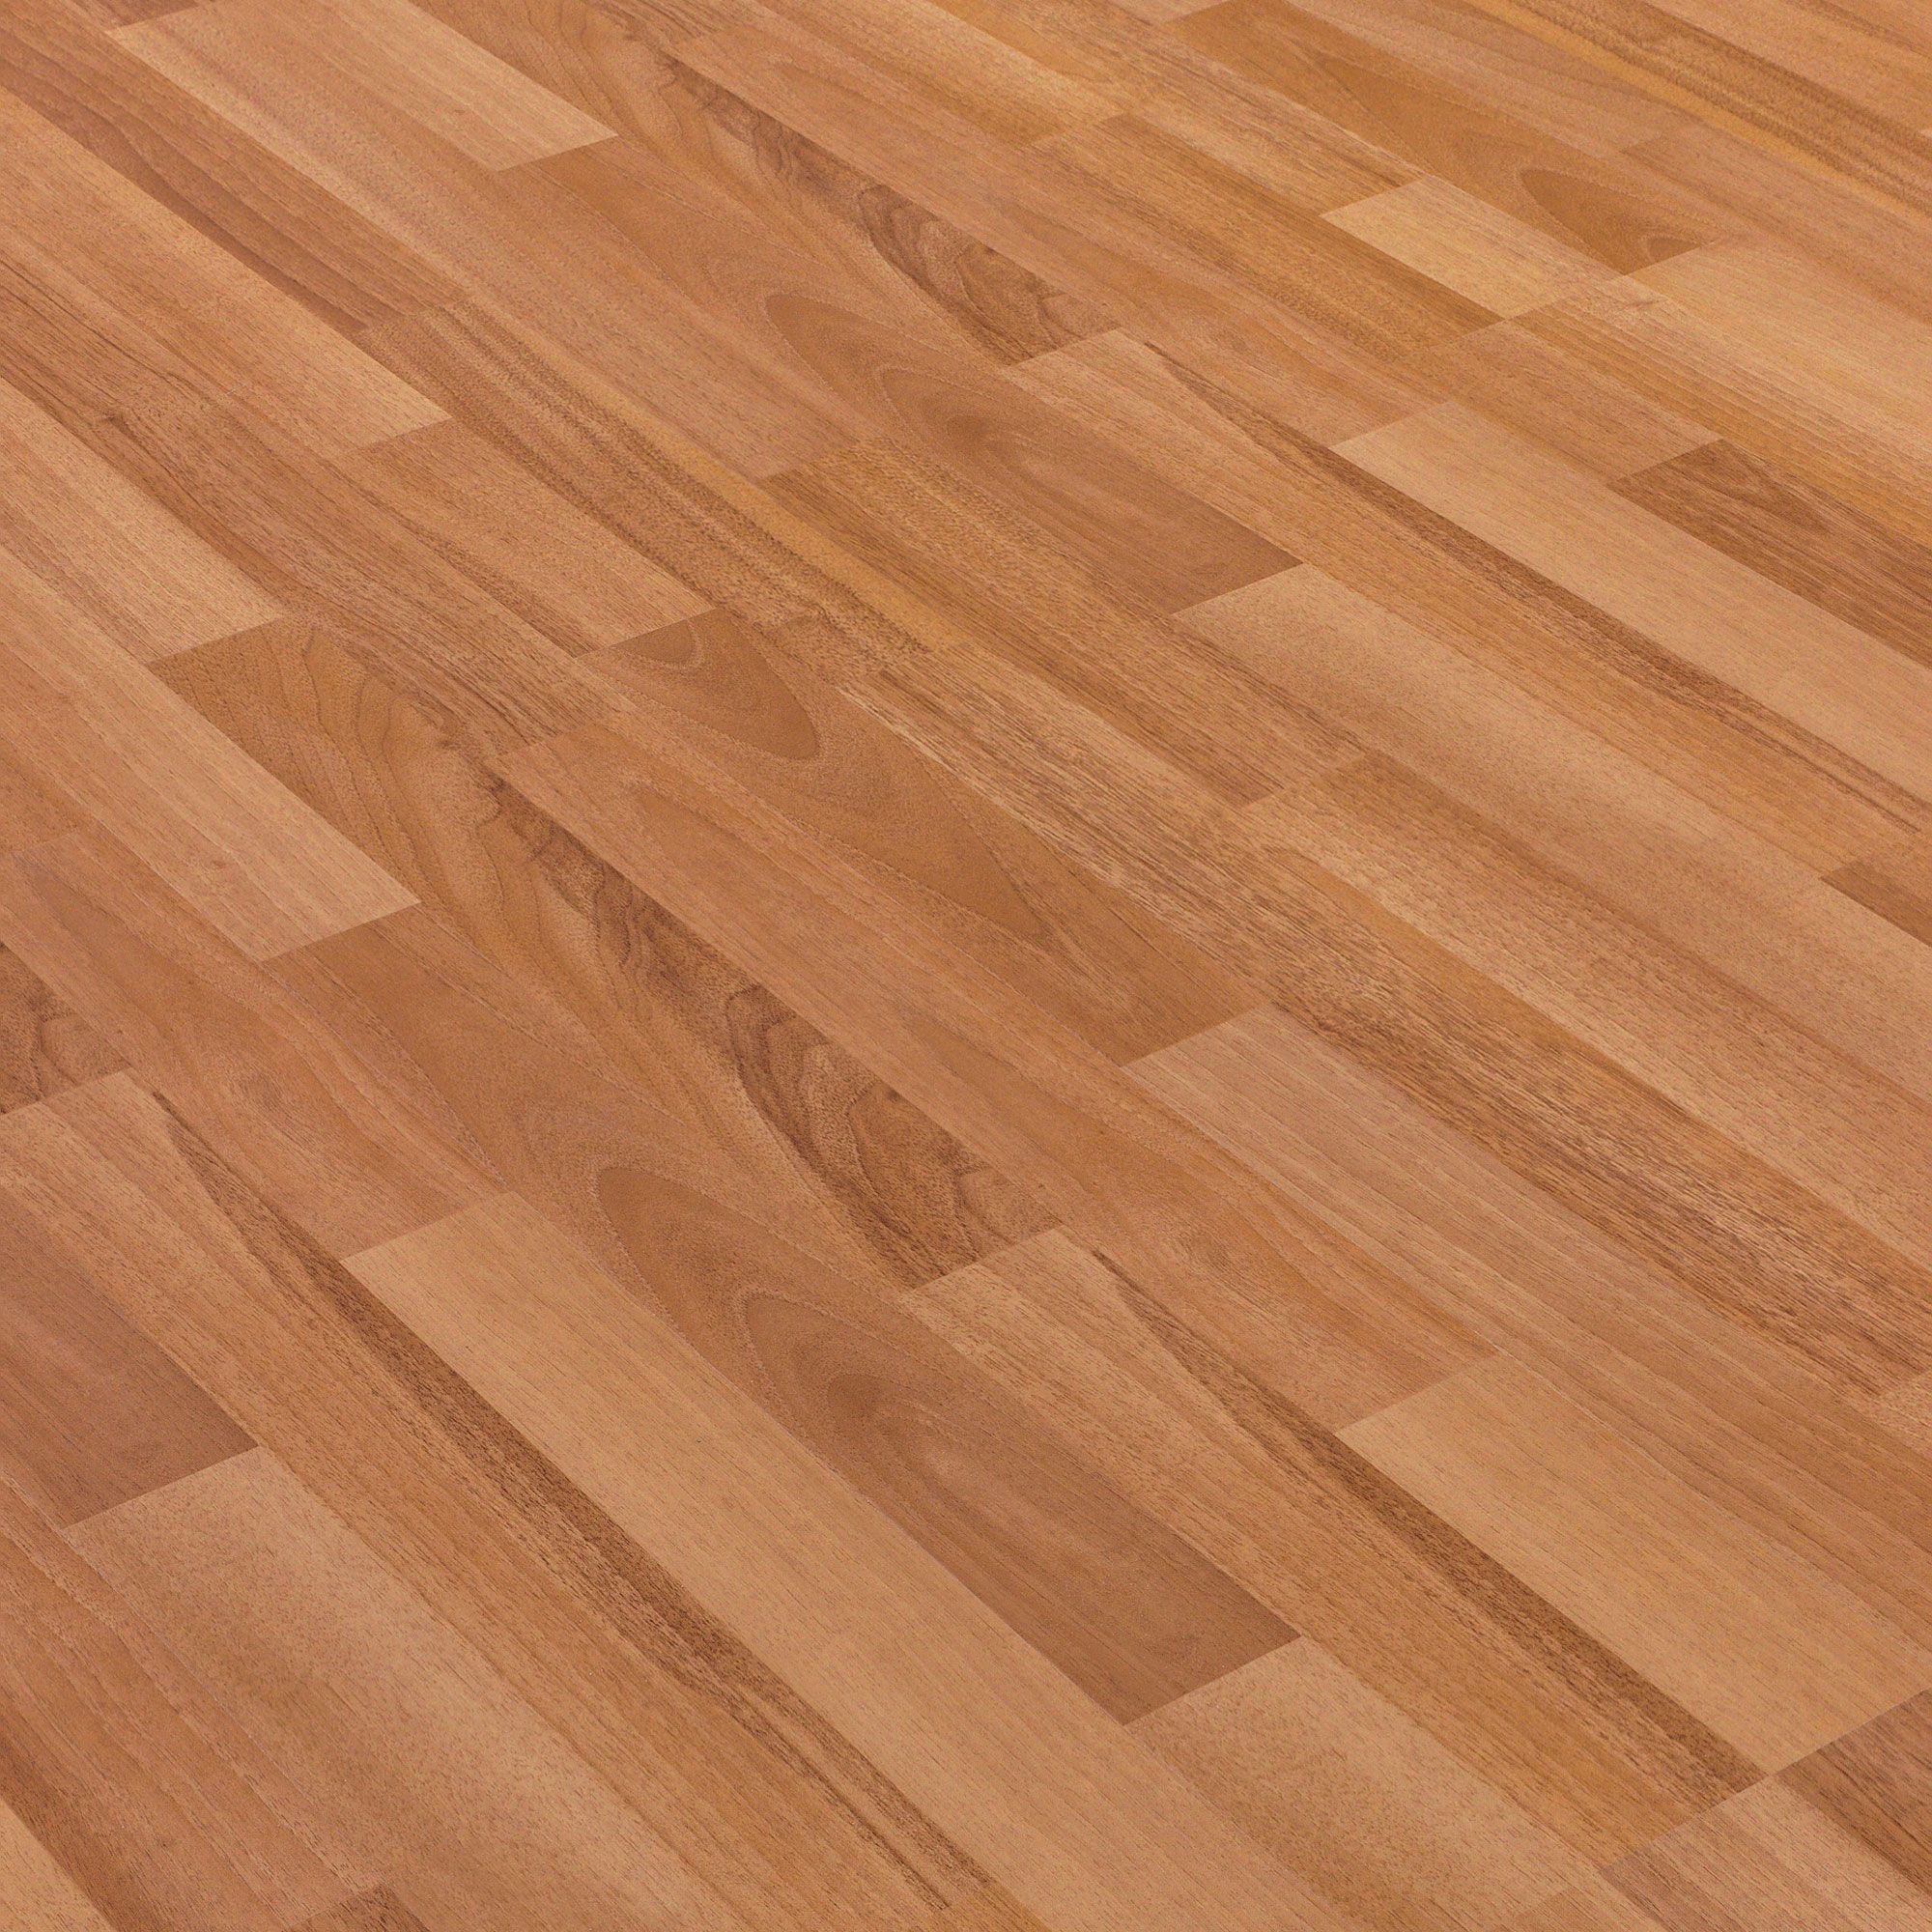 Kronoswiss Prestige Country Walnut 7mm Textured Laminate Flooring